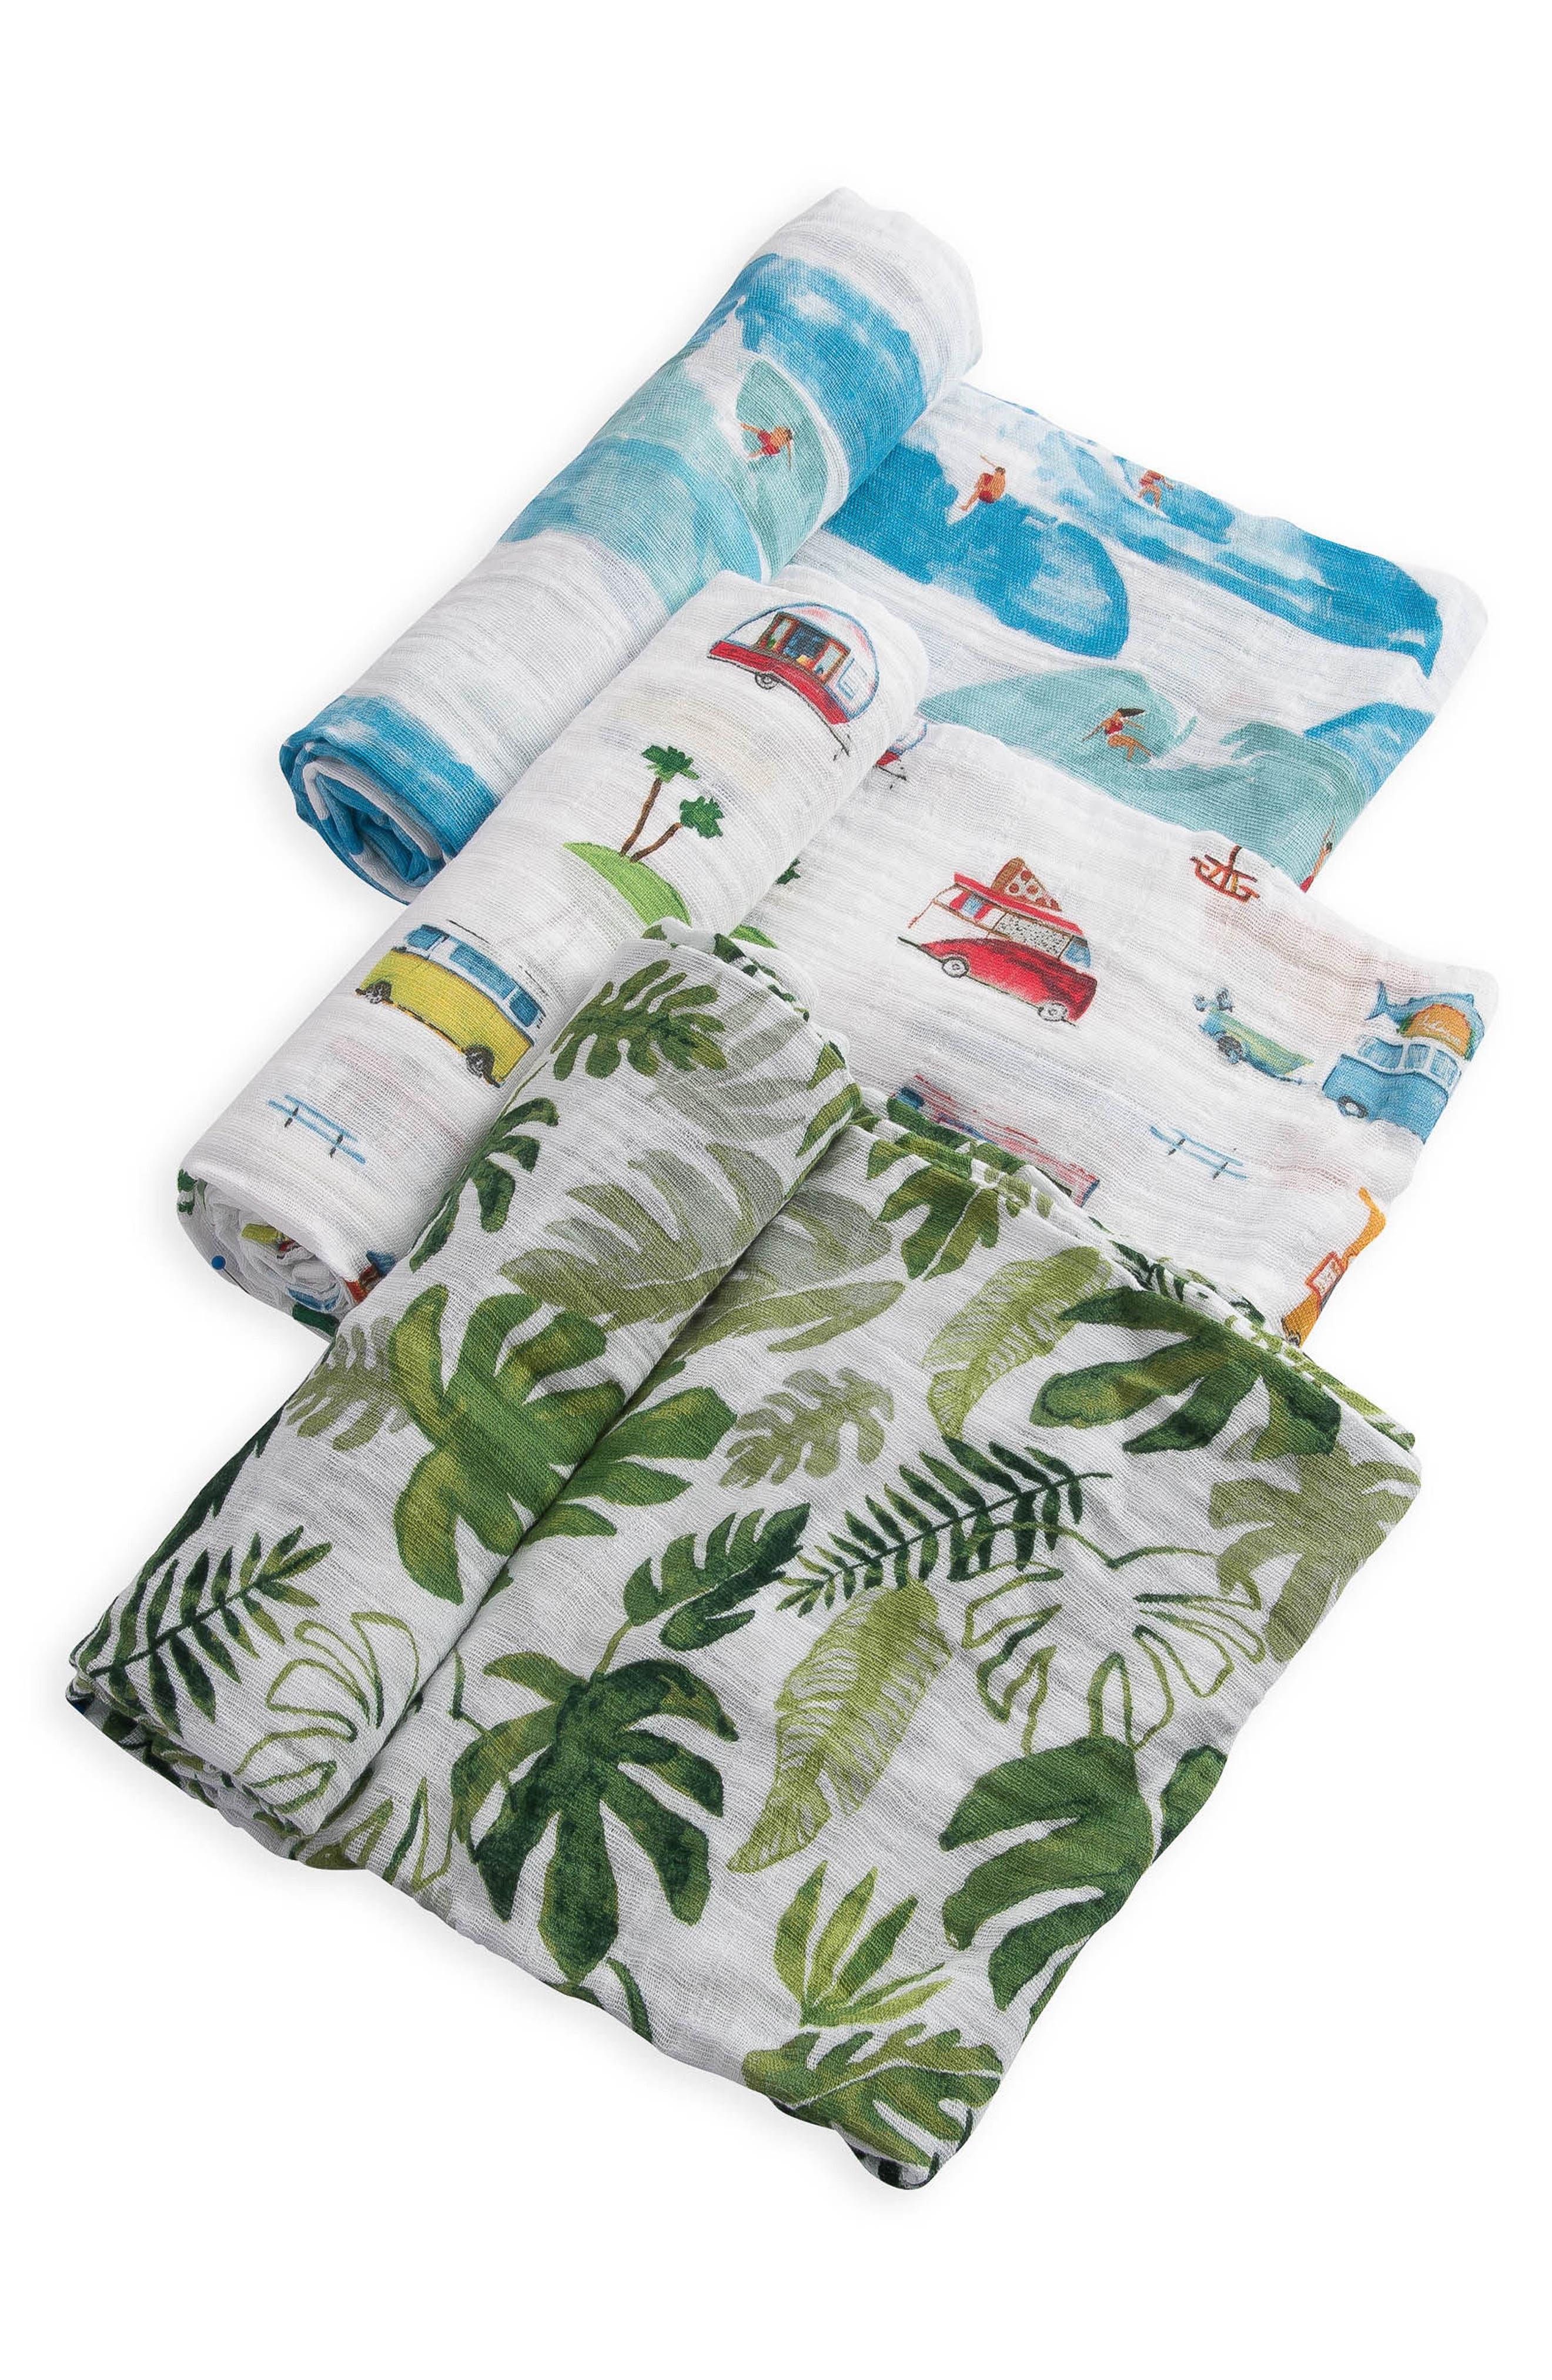 3-Pack Cotton Muslin Blankets,                             Main thumbnail 1, color,                             SUMMER VIBE